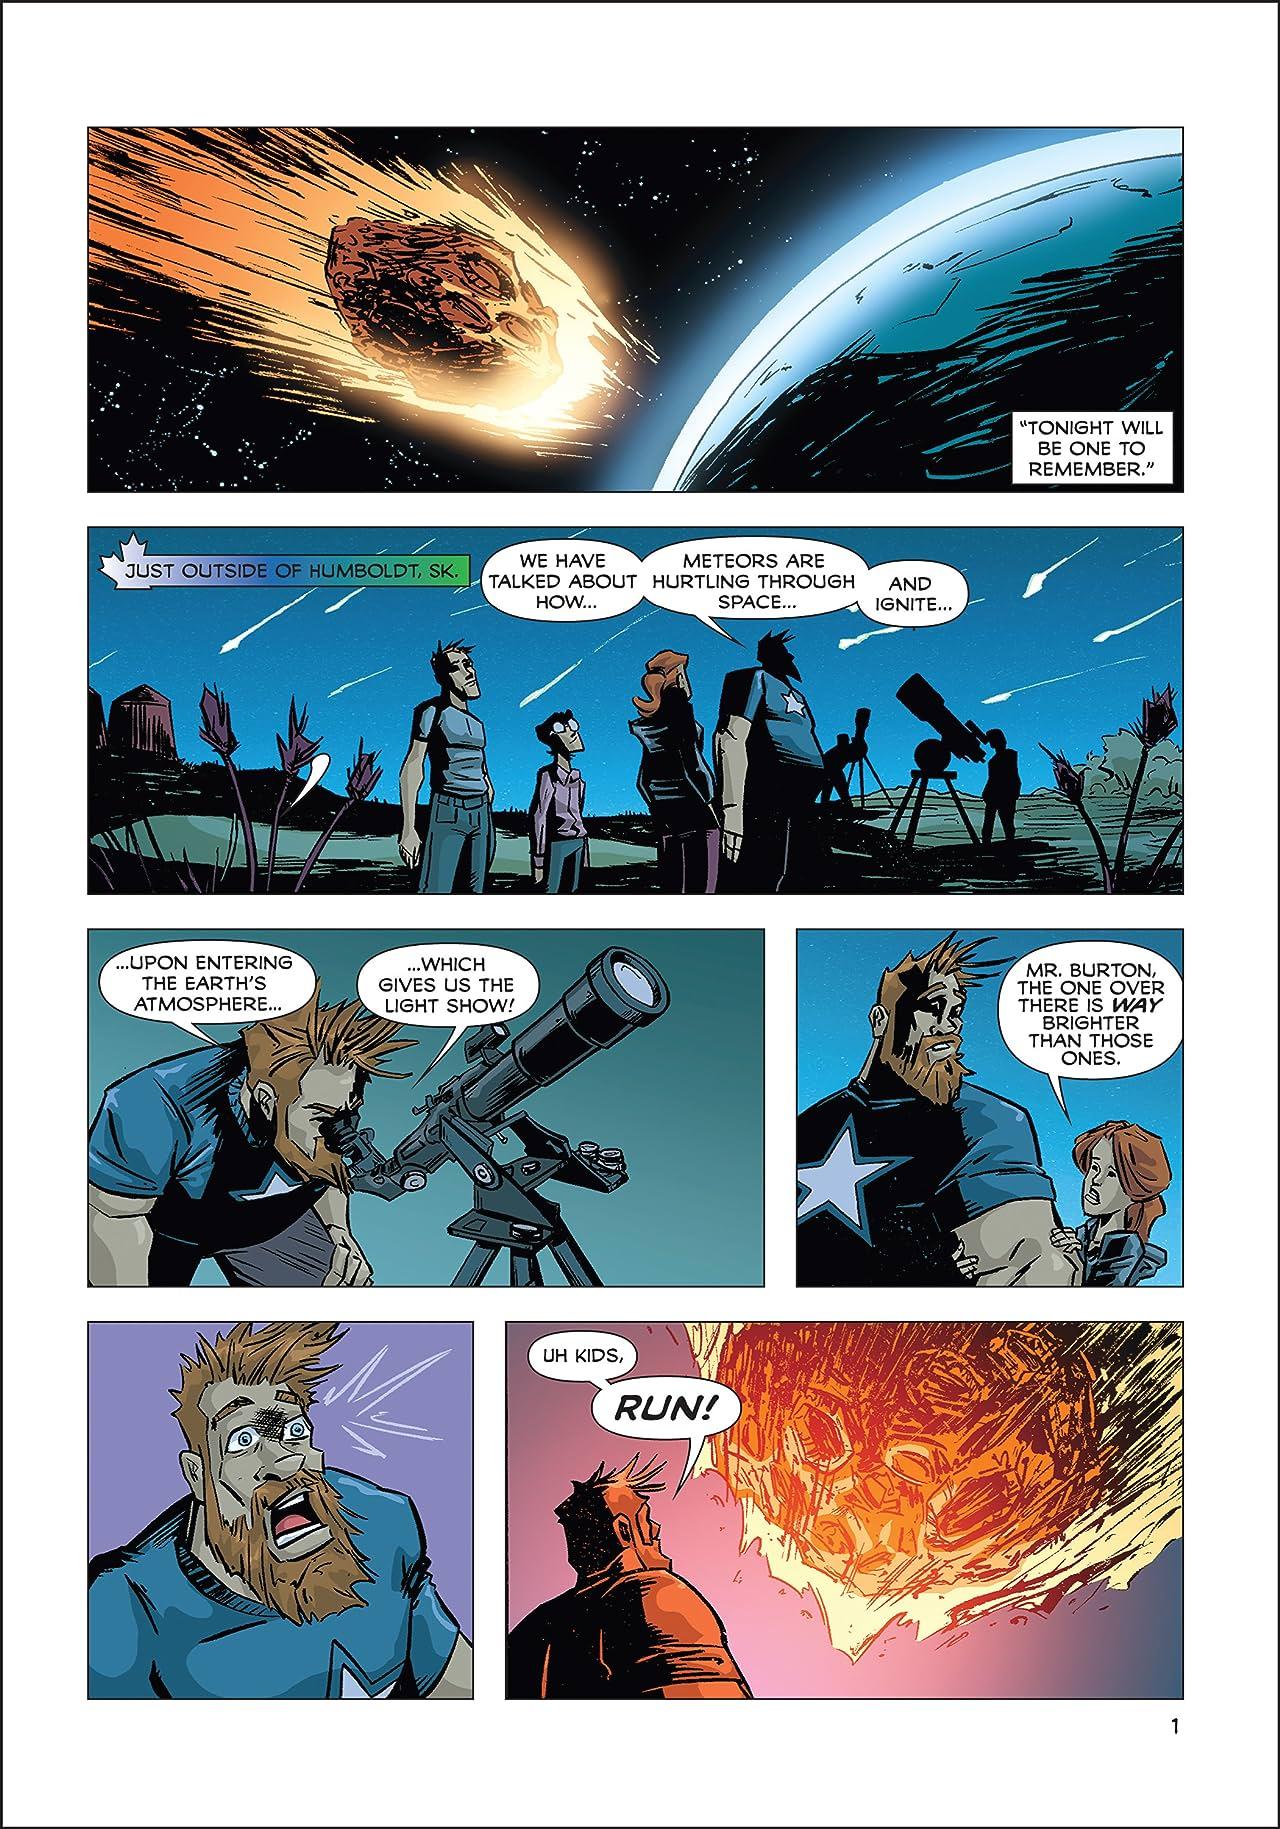 The Adventures of Auroraman: Season 1